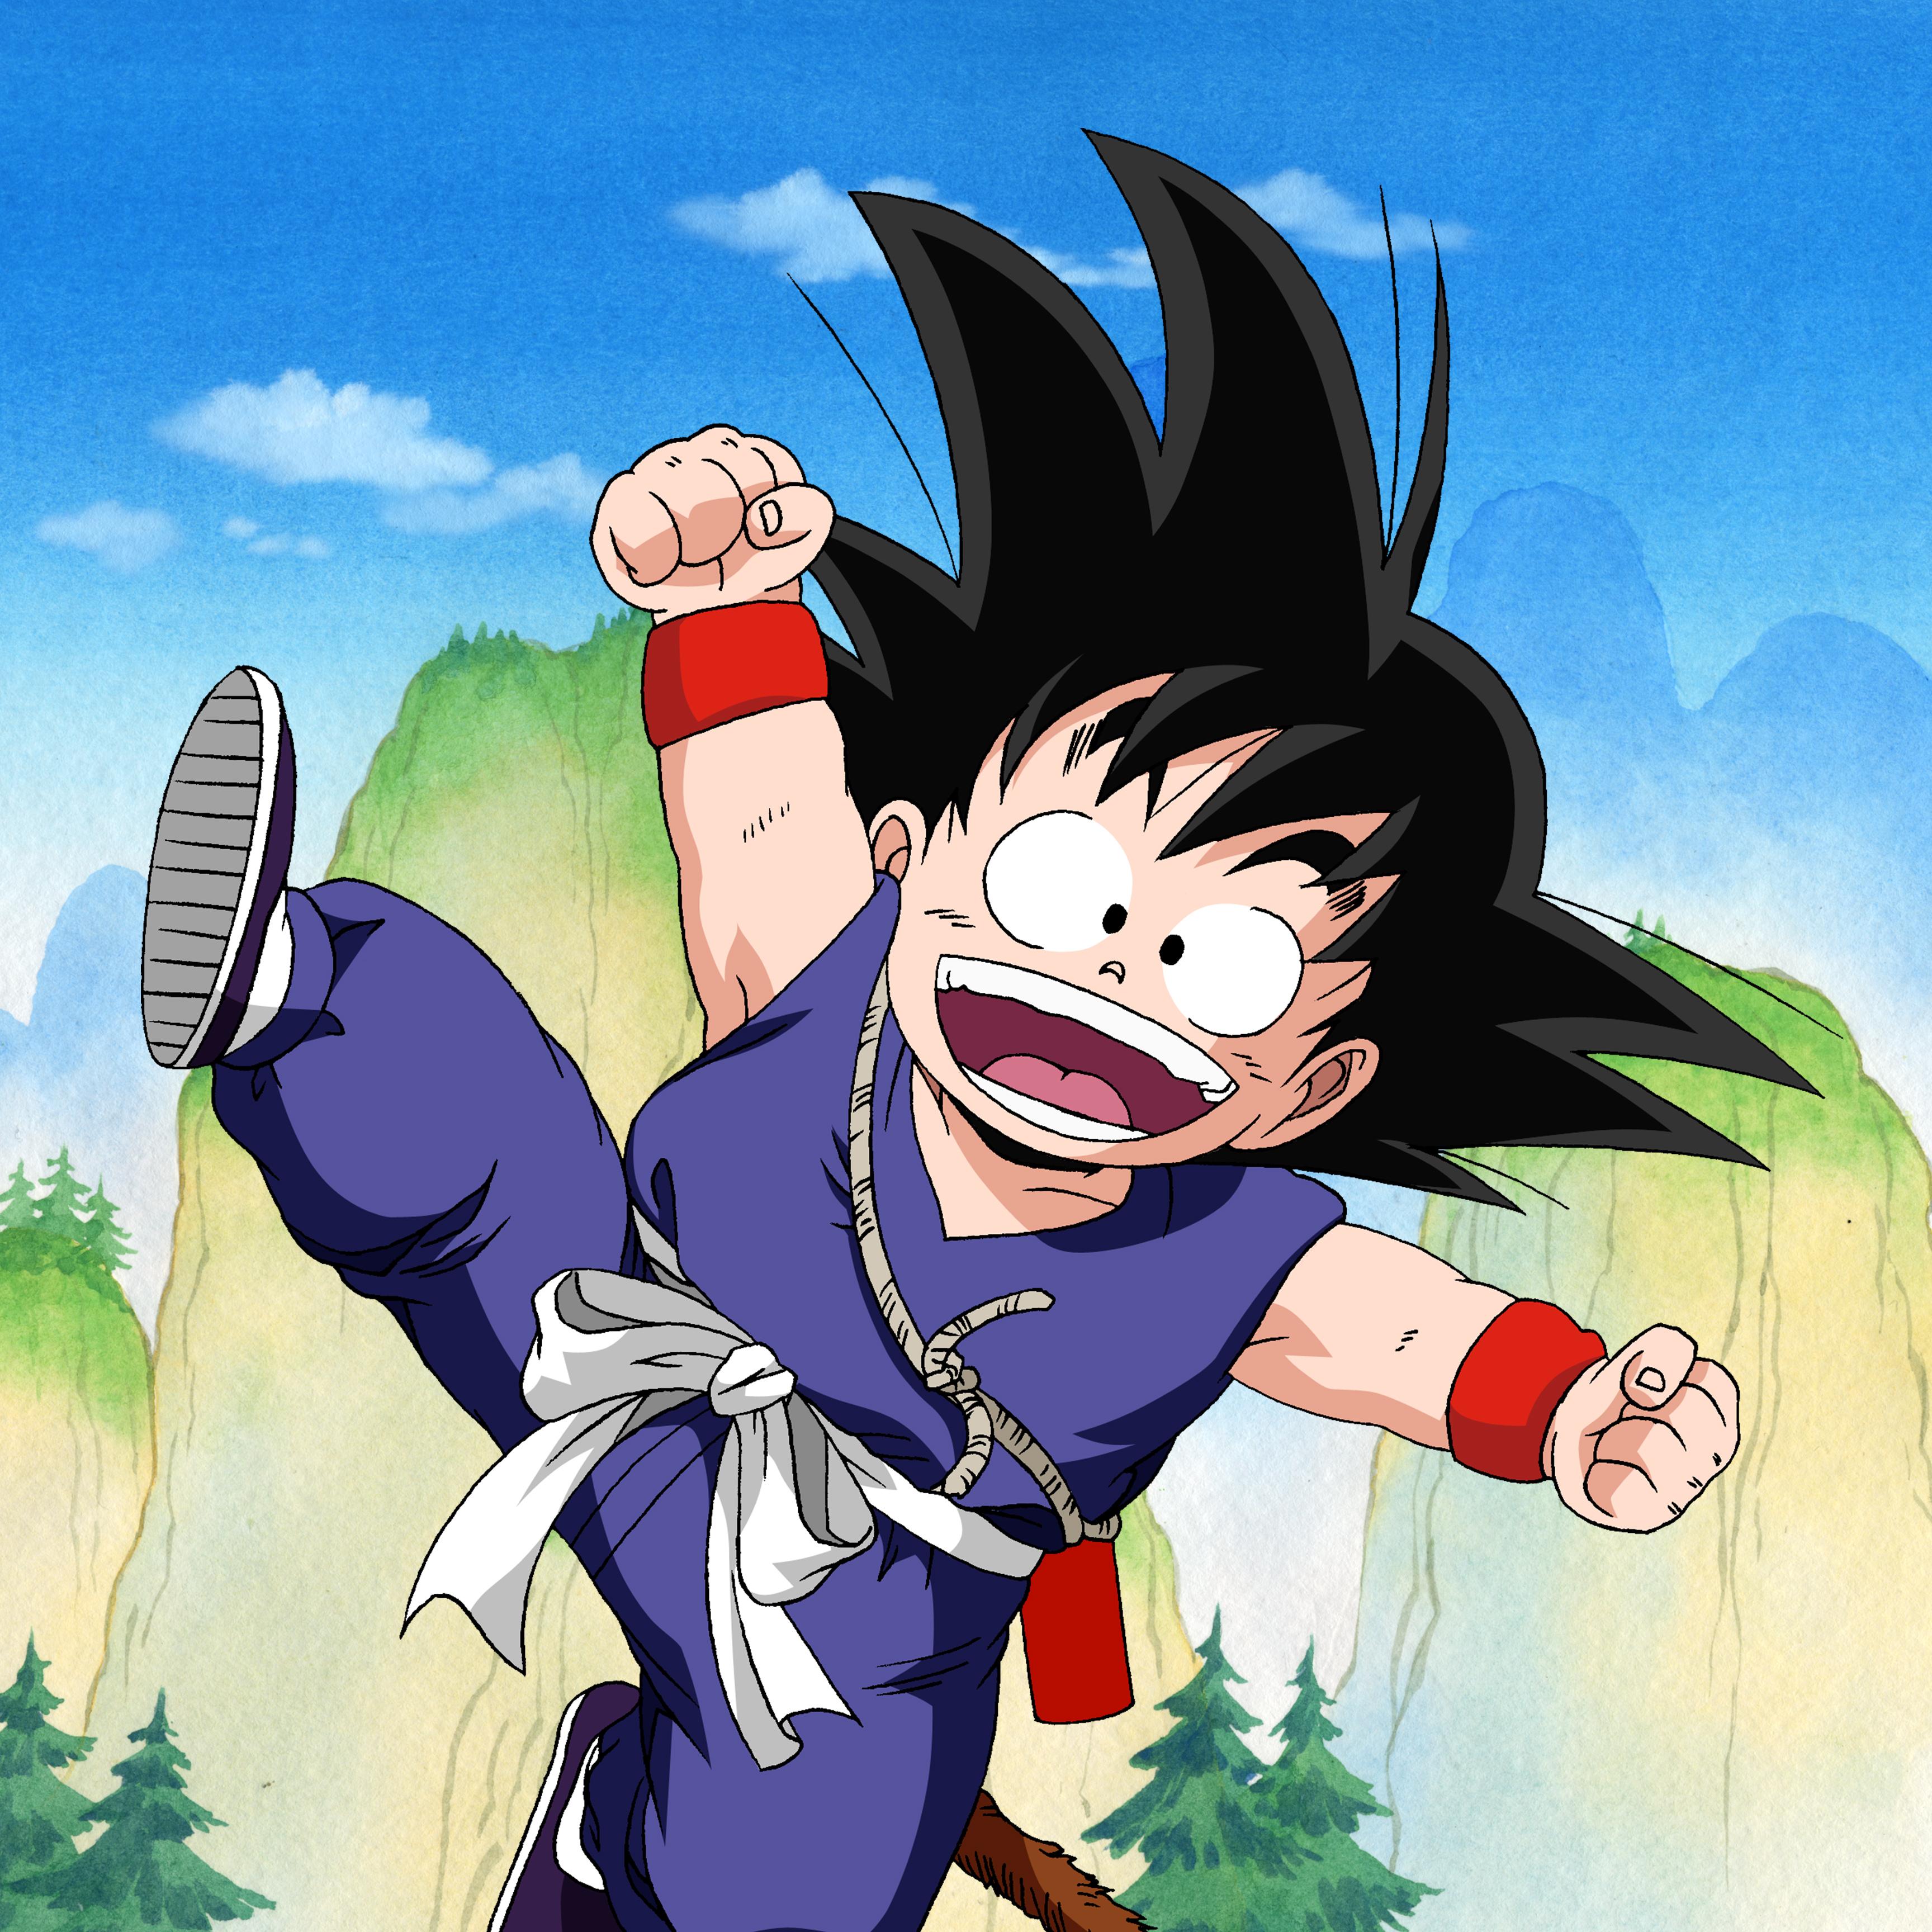 Watch dragon ball episodes sub dub action adventure comedy fan service fantasy anime funimation